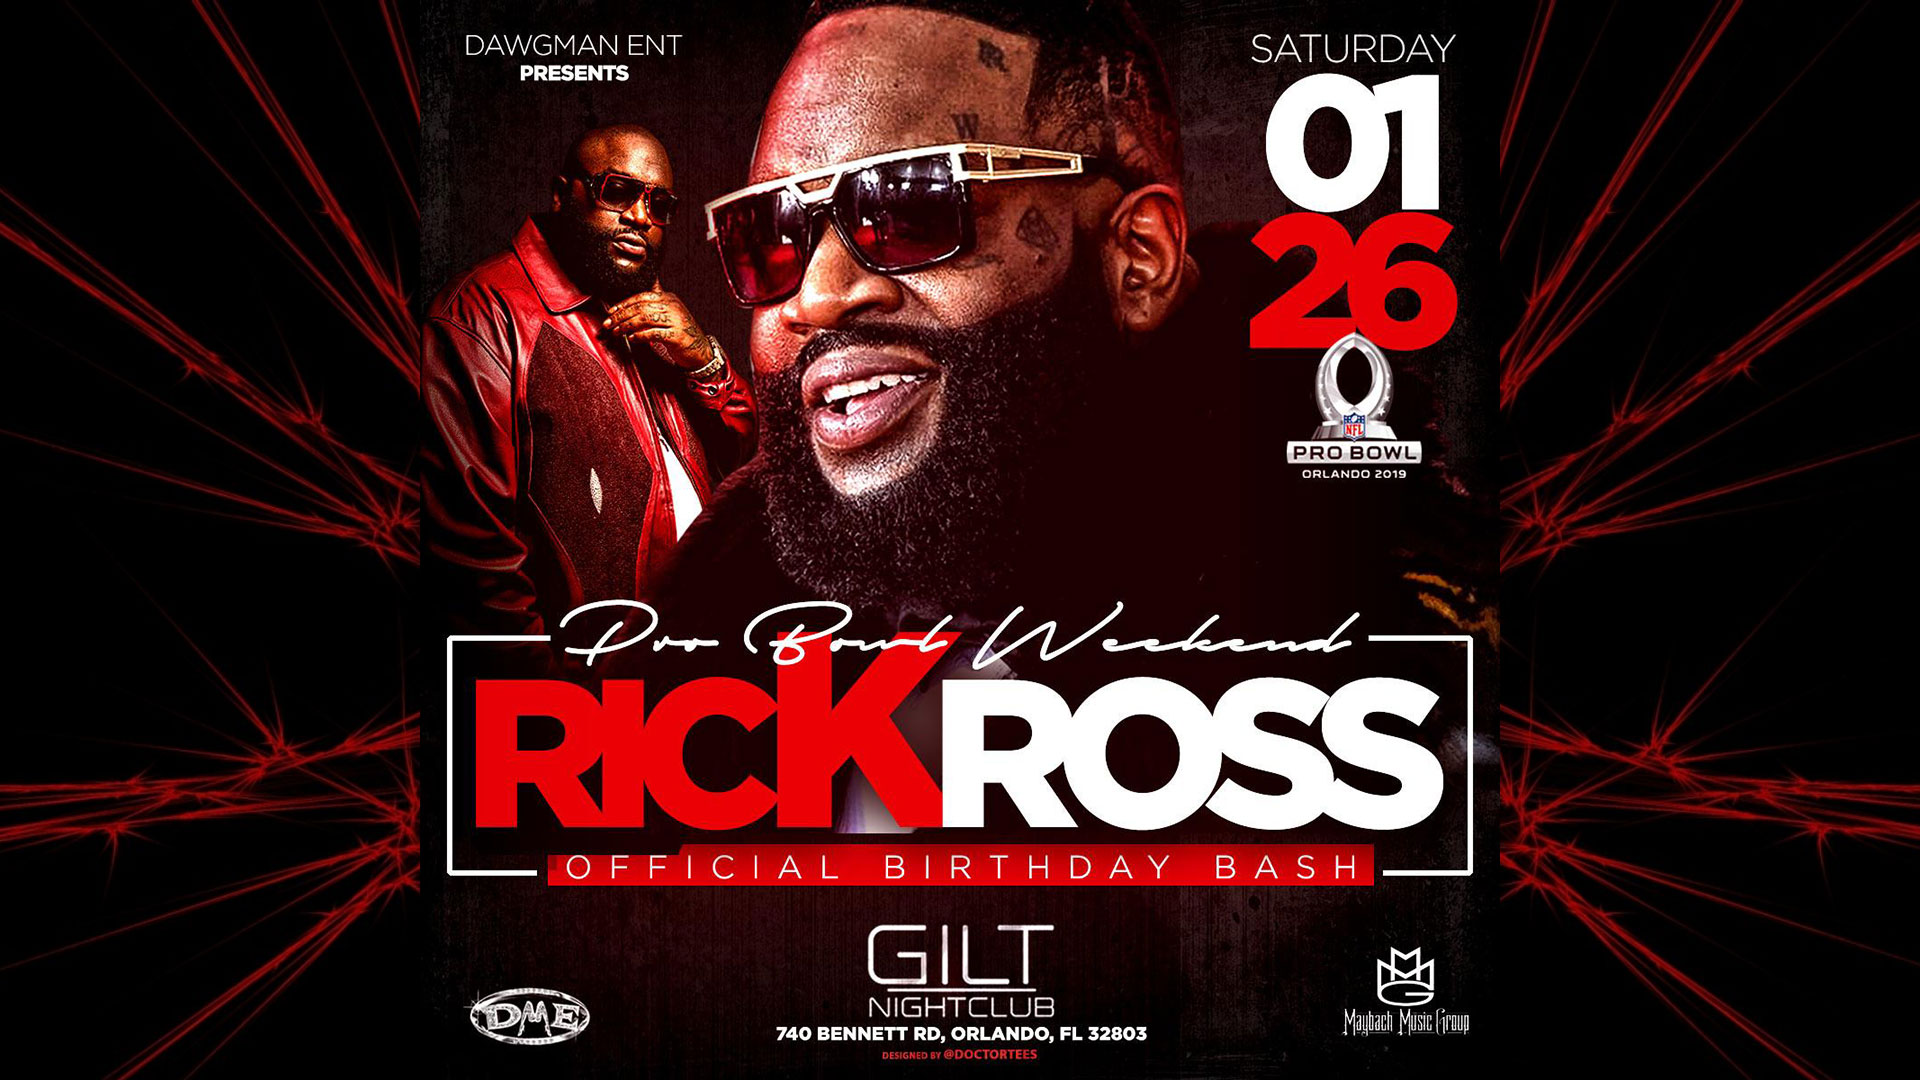 Rick-Ross-2019-flyer